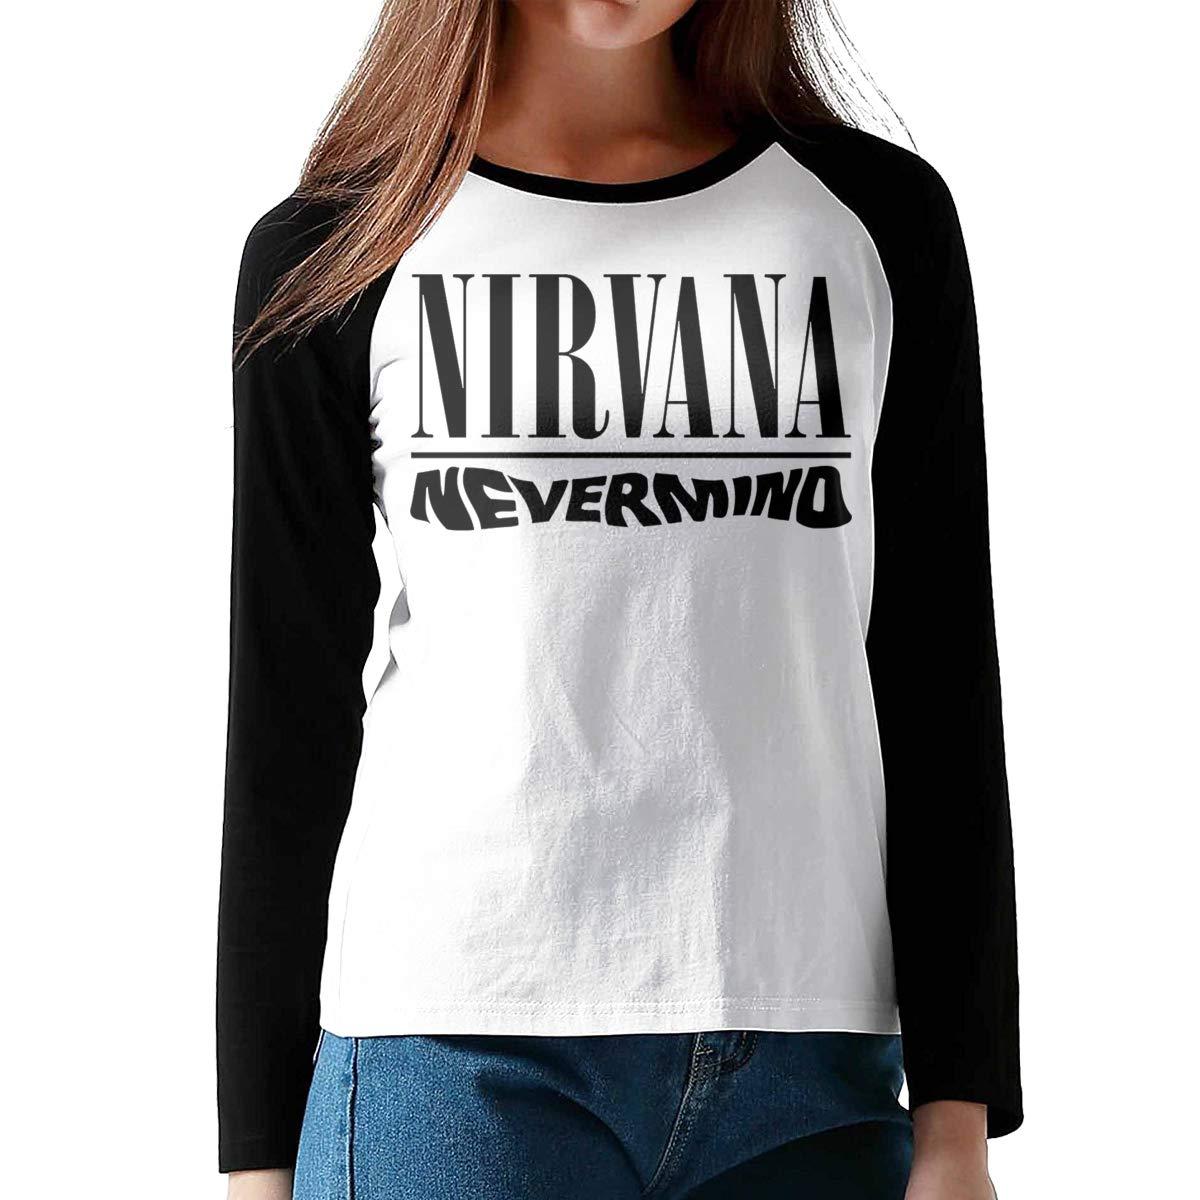 Audarey Rus Nirvan A Nevermino Logo Neck Fashion 2300 Shirts